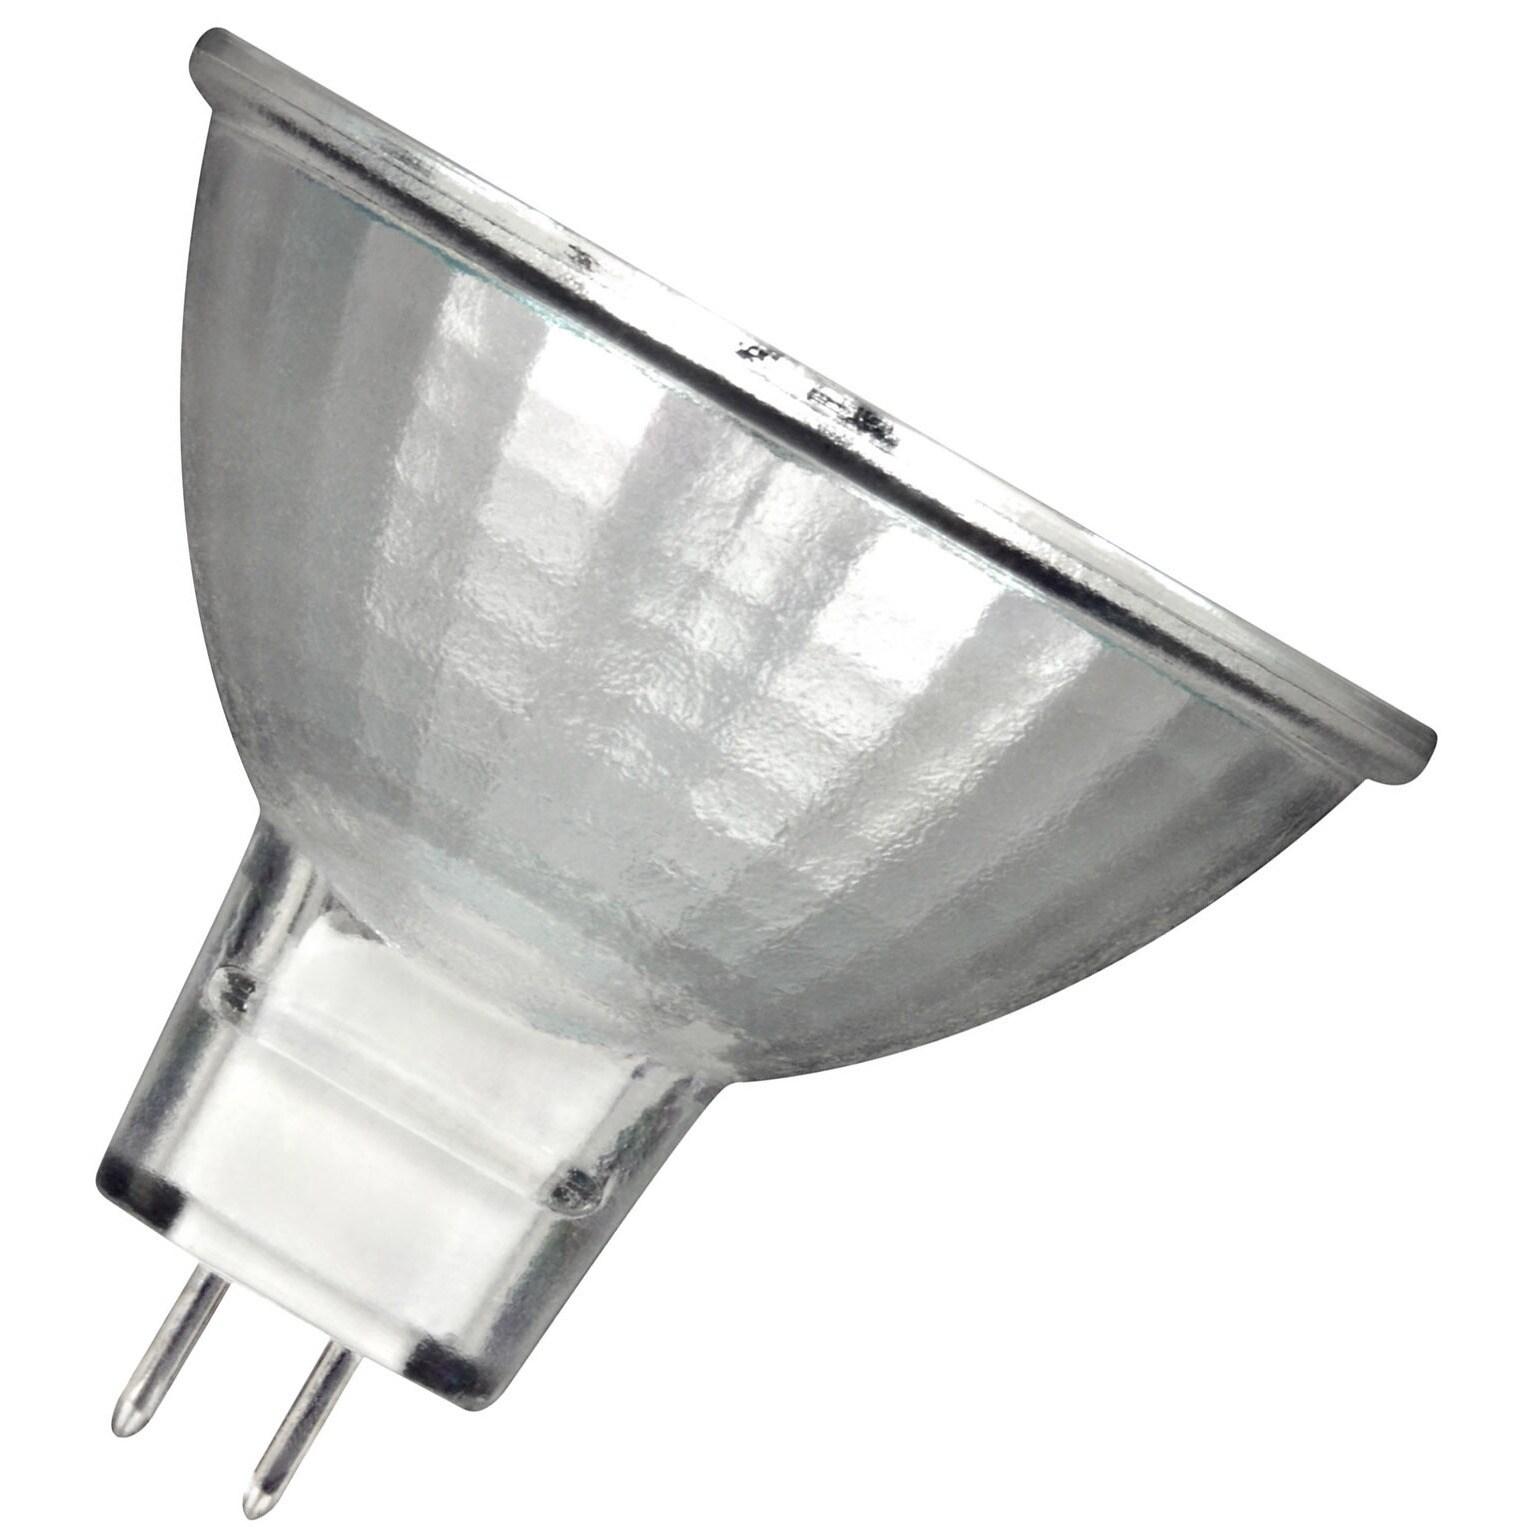 FEIT Electric Bpexn Halogen Quartz Reflector Flood Light ...